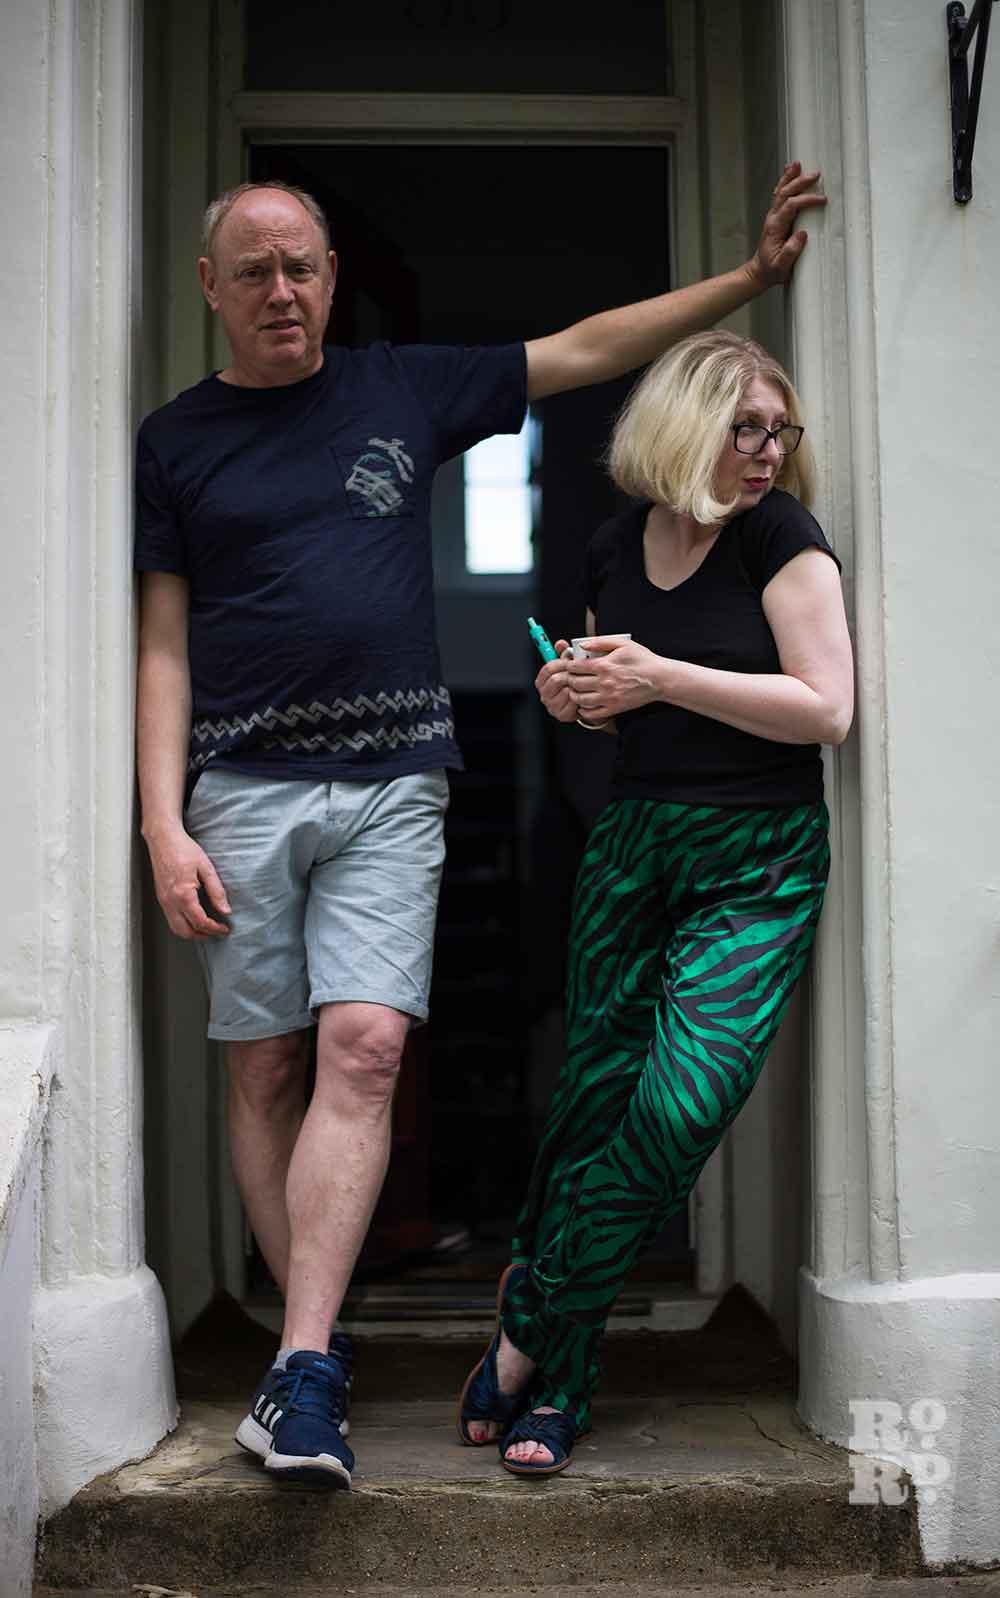 Michelle a local artist and partner on doorstep environmental portraits by Matt Payne